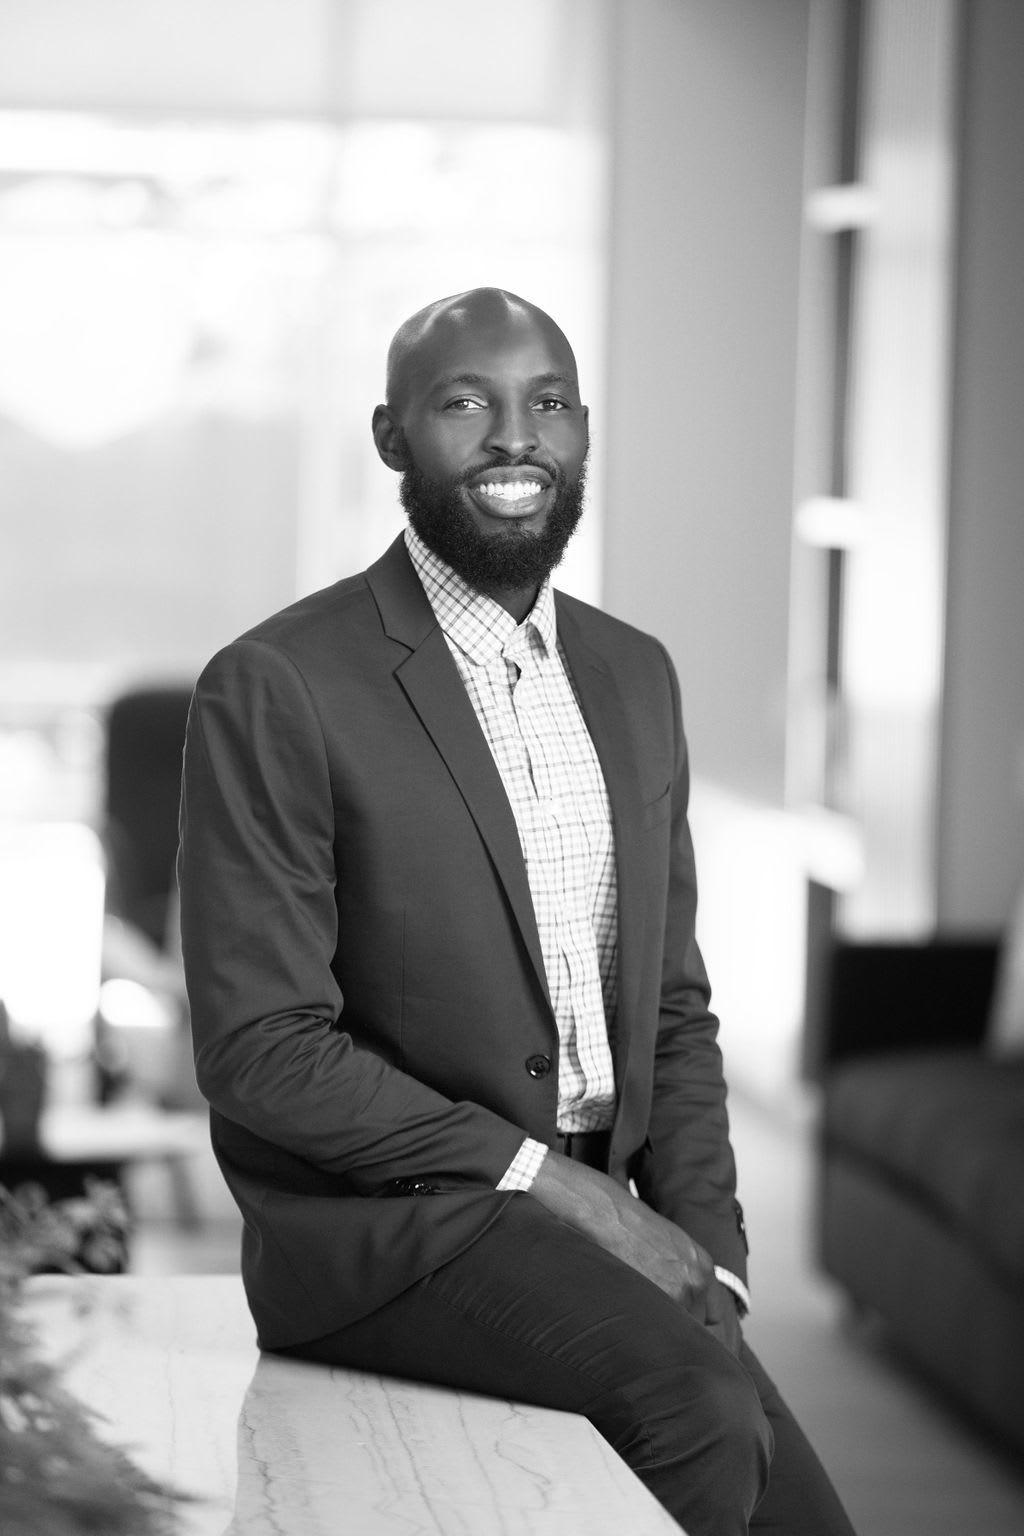 Team member Charles Nwankpa at CREA Management in Austin, Texas